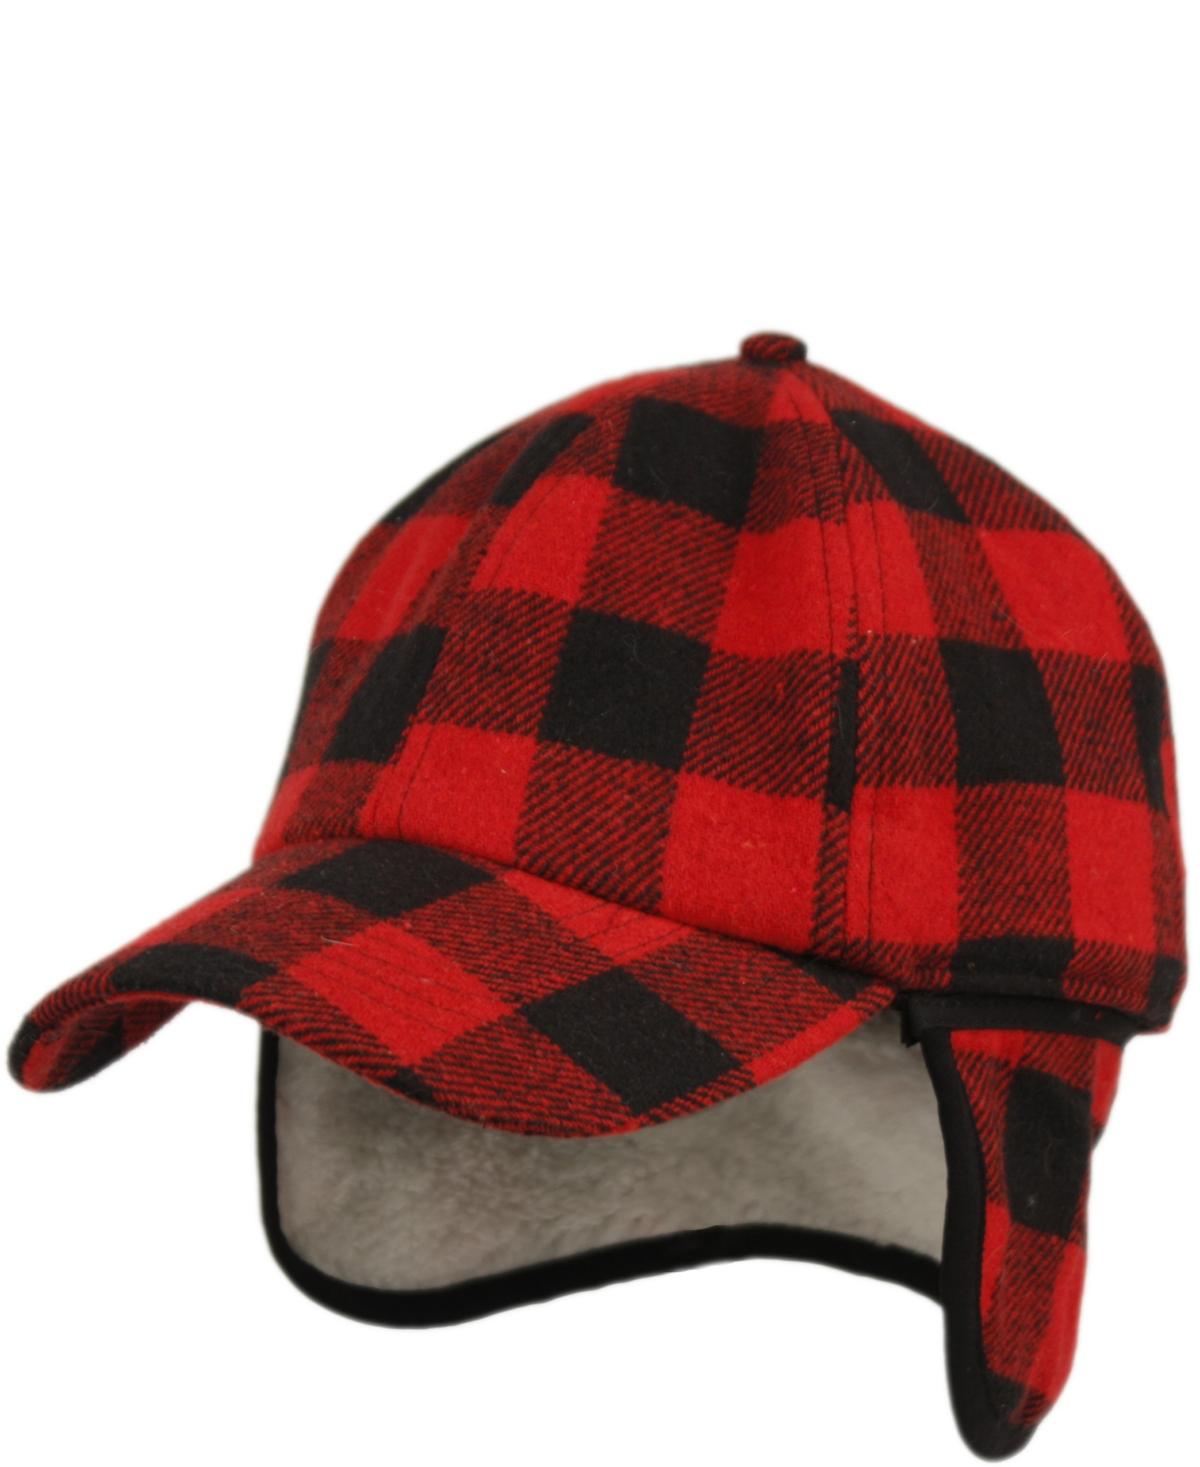 Epoch Hats Company Wool Blend Earflap Cap with Sherpa Lining